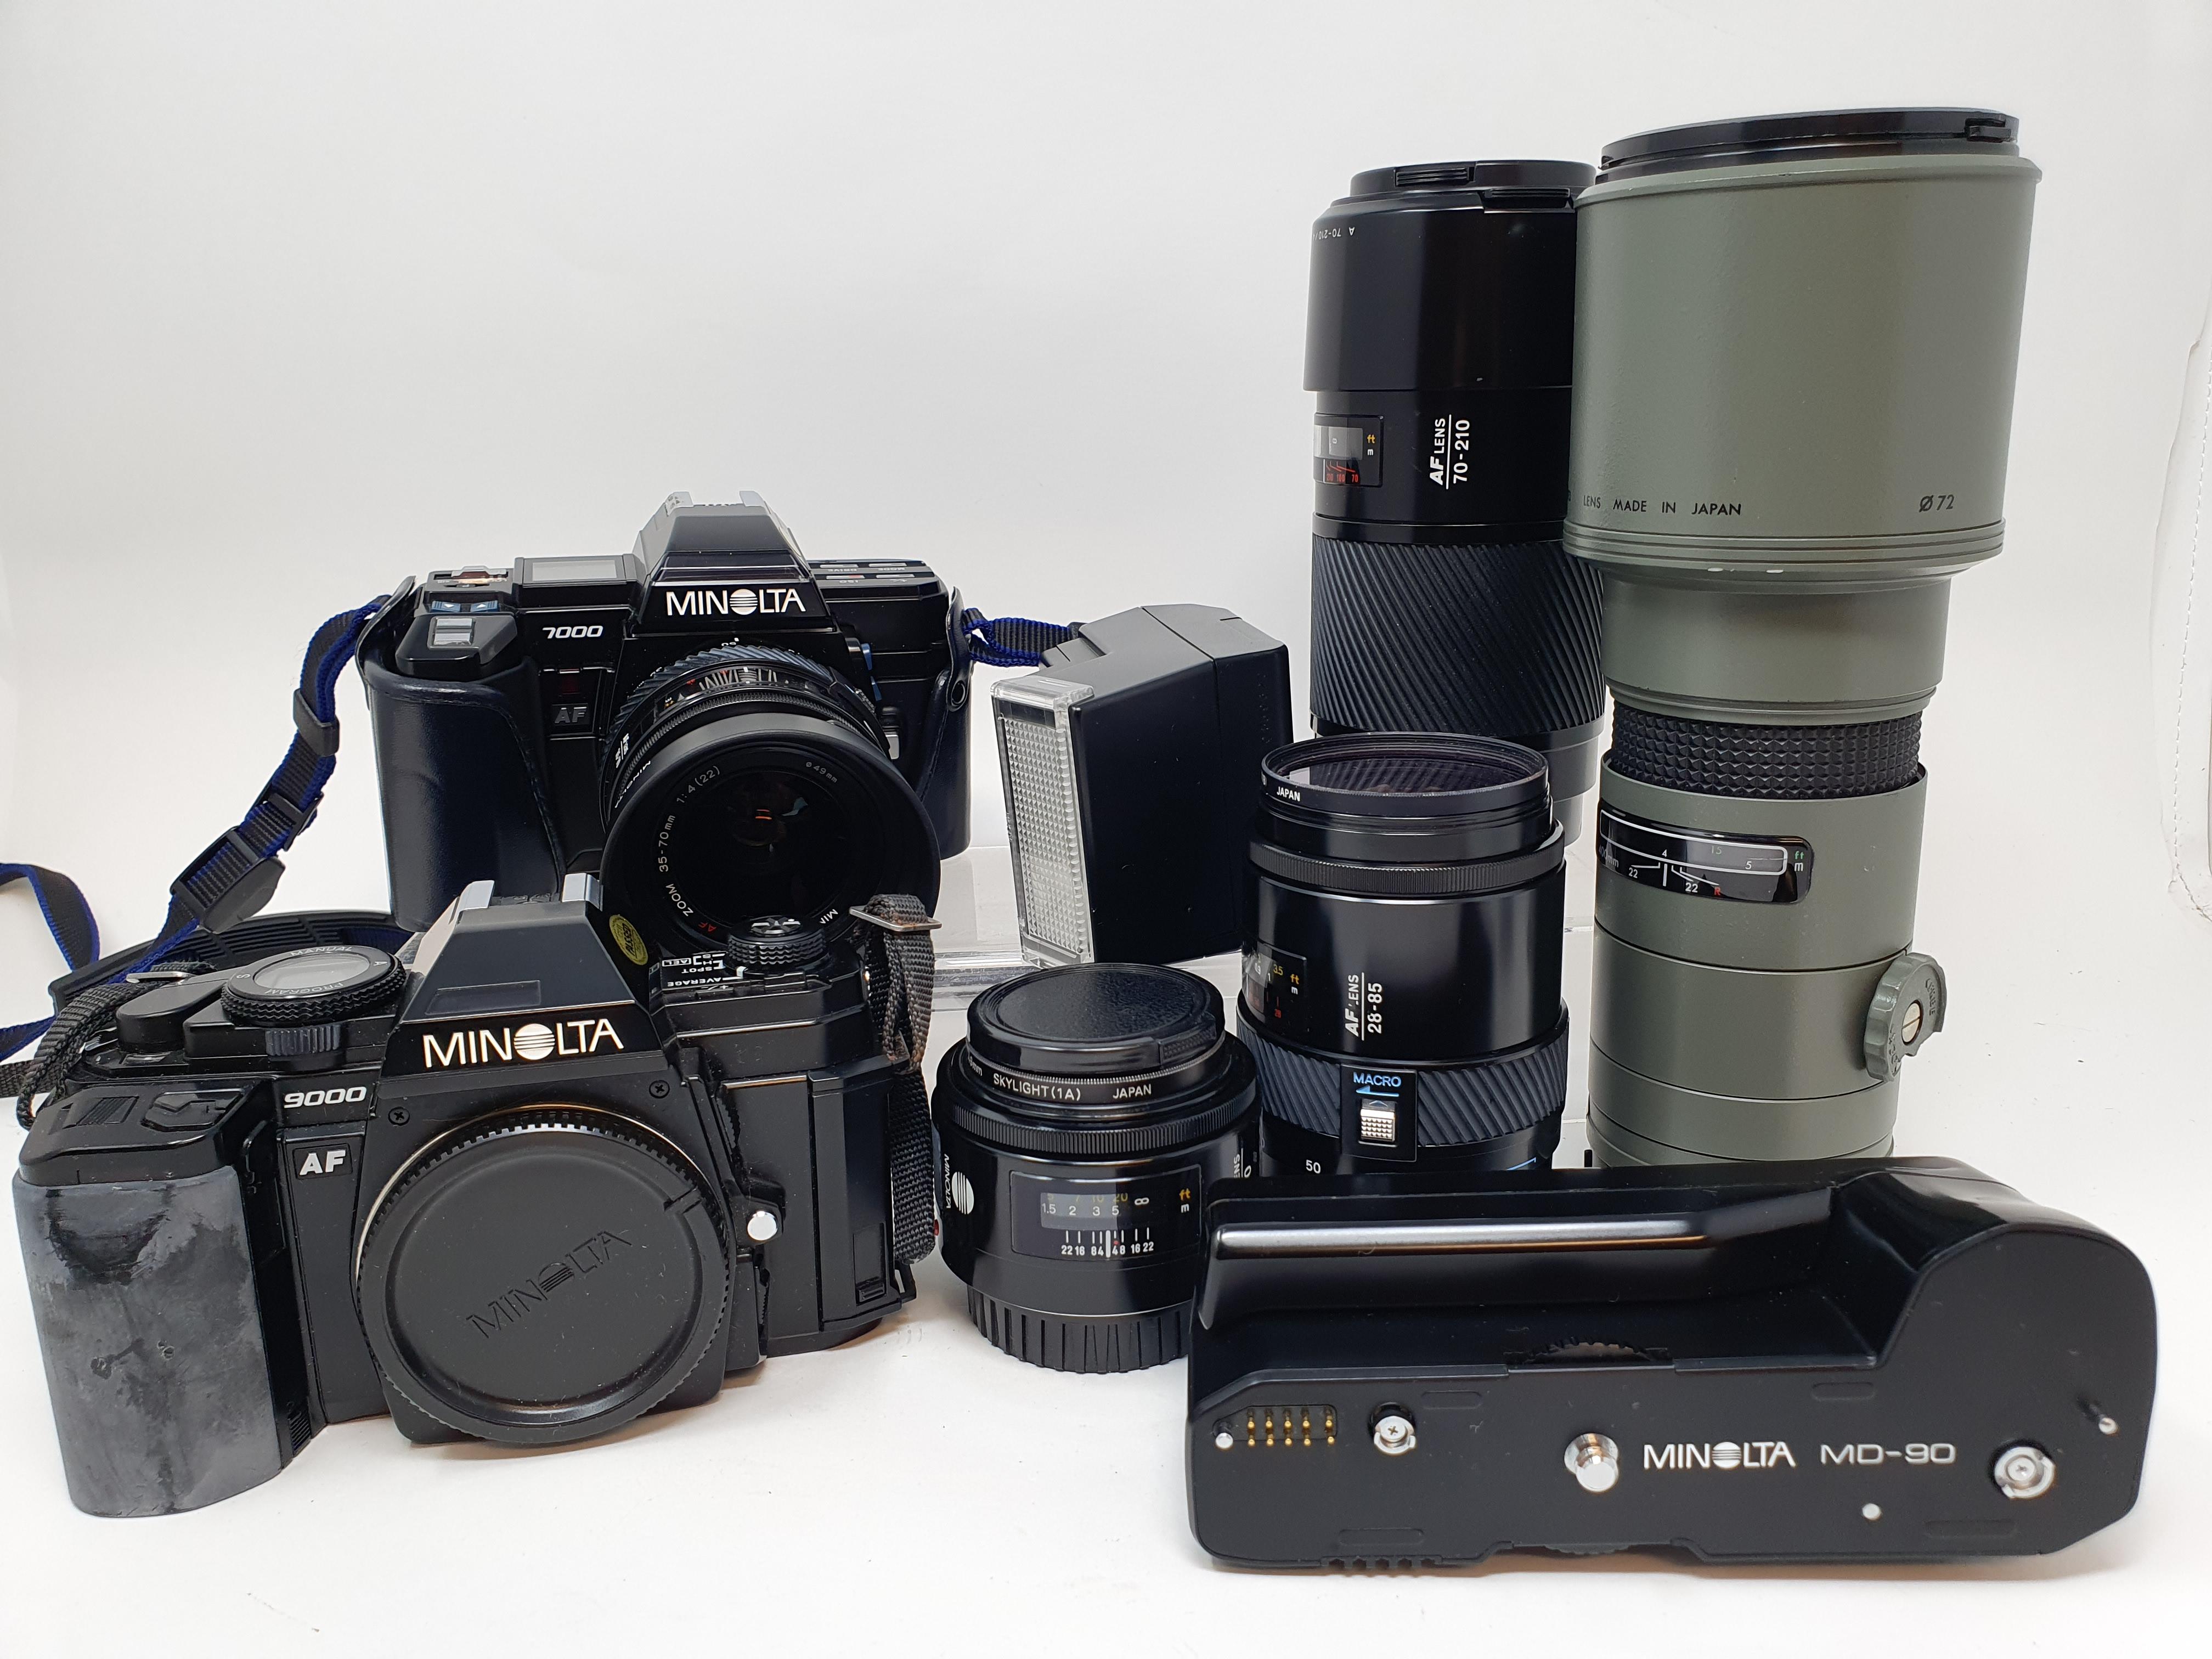 A Minolta 9000 camera, a Minolta 7000 camera, various lenses and accessories in a carrying case